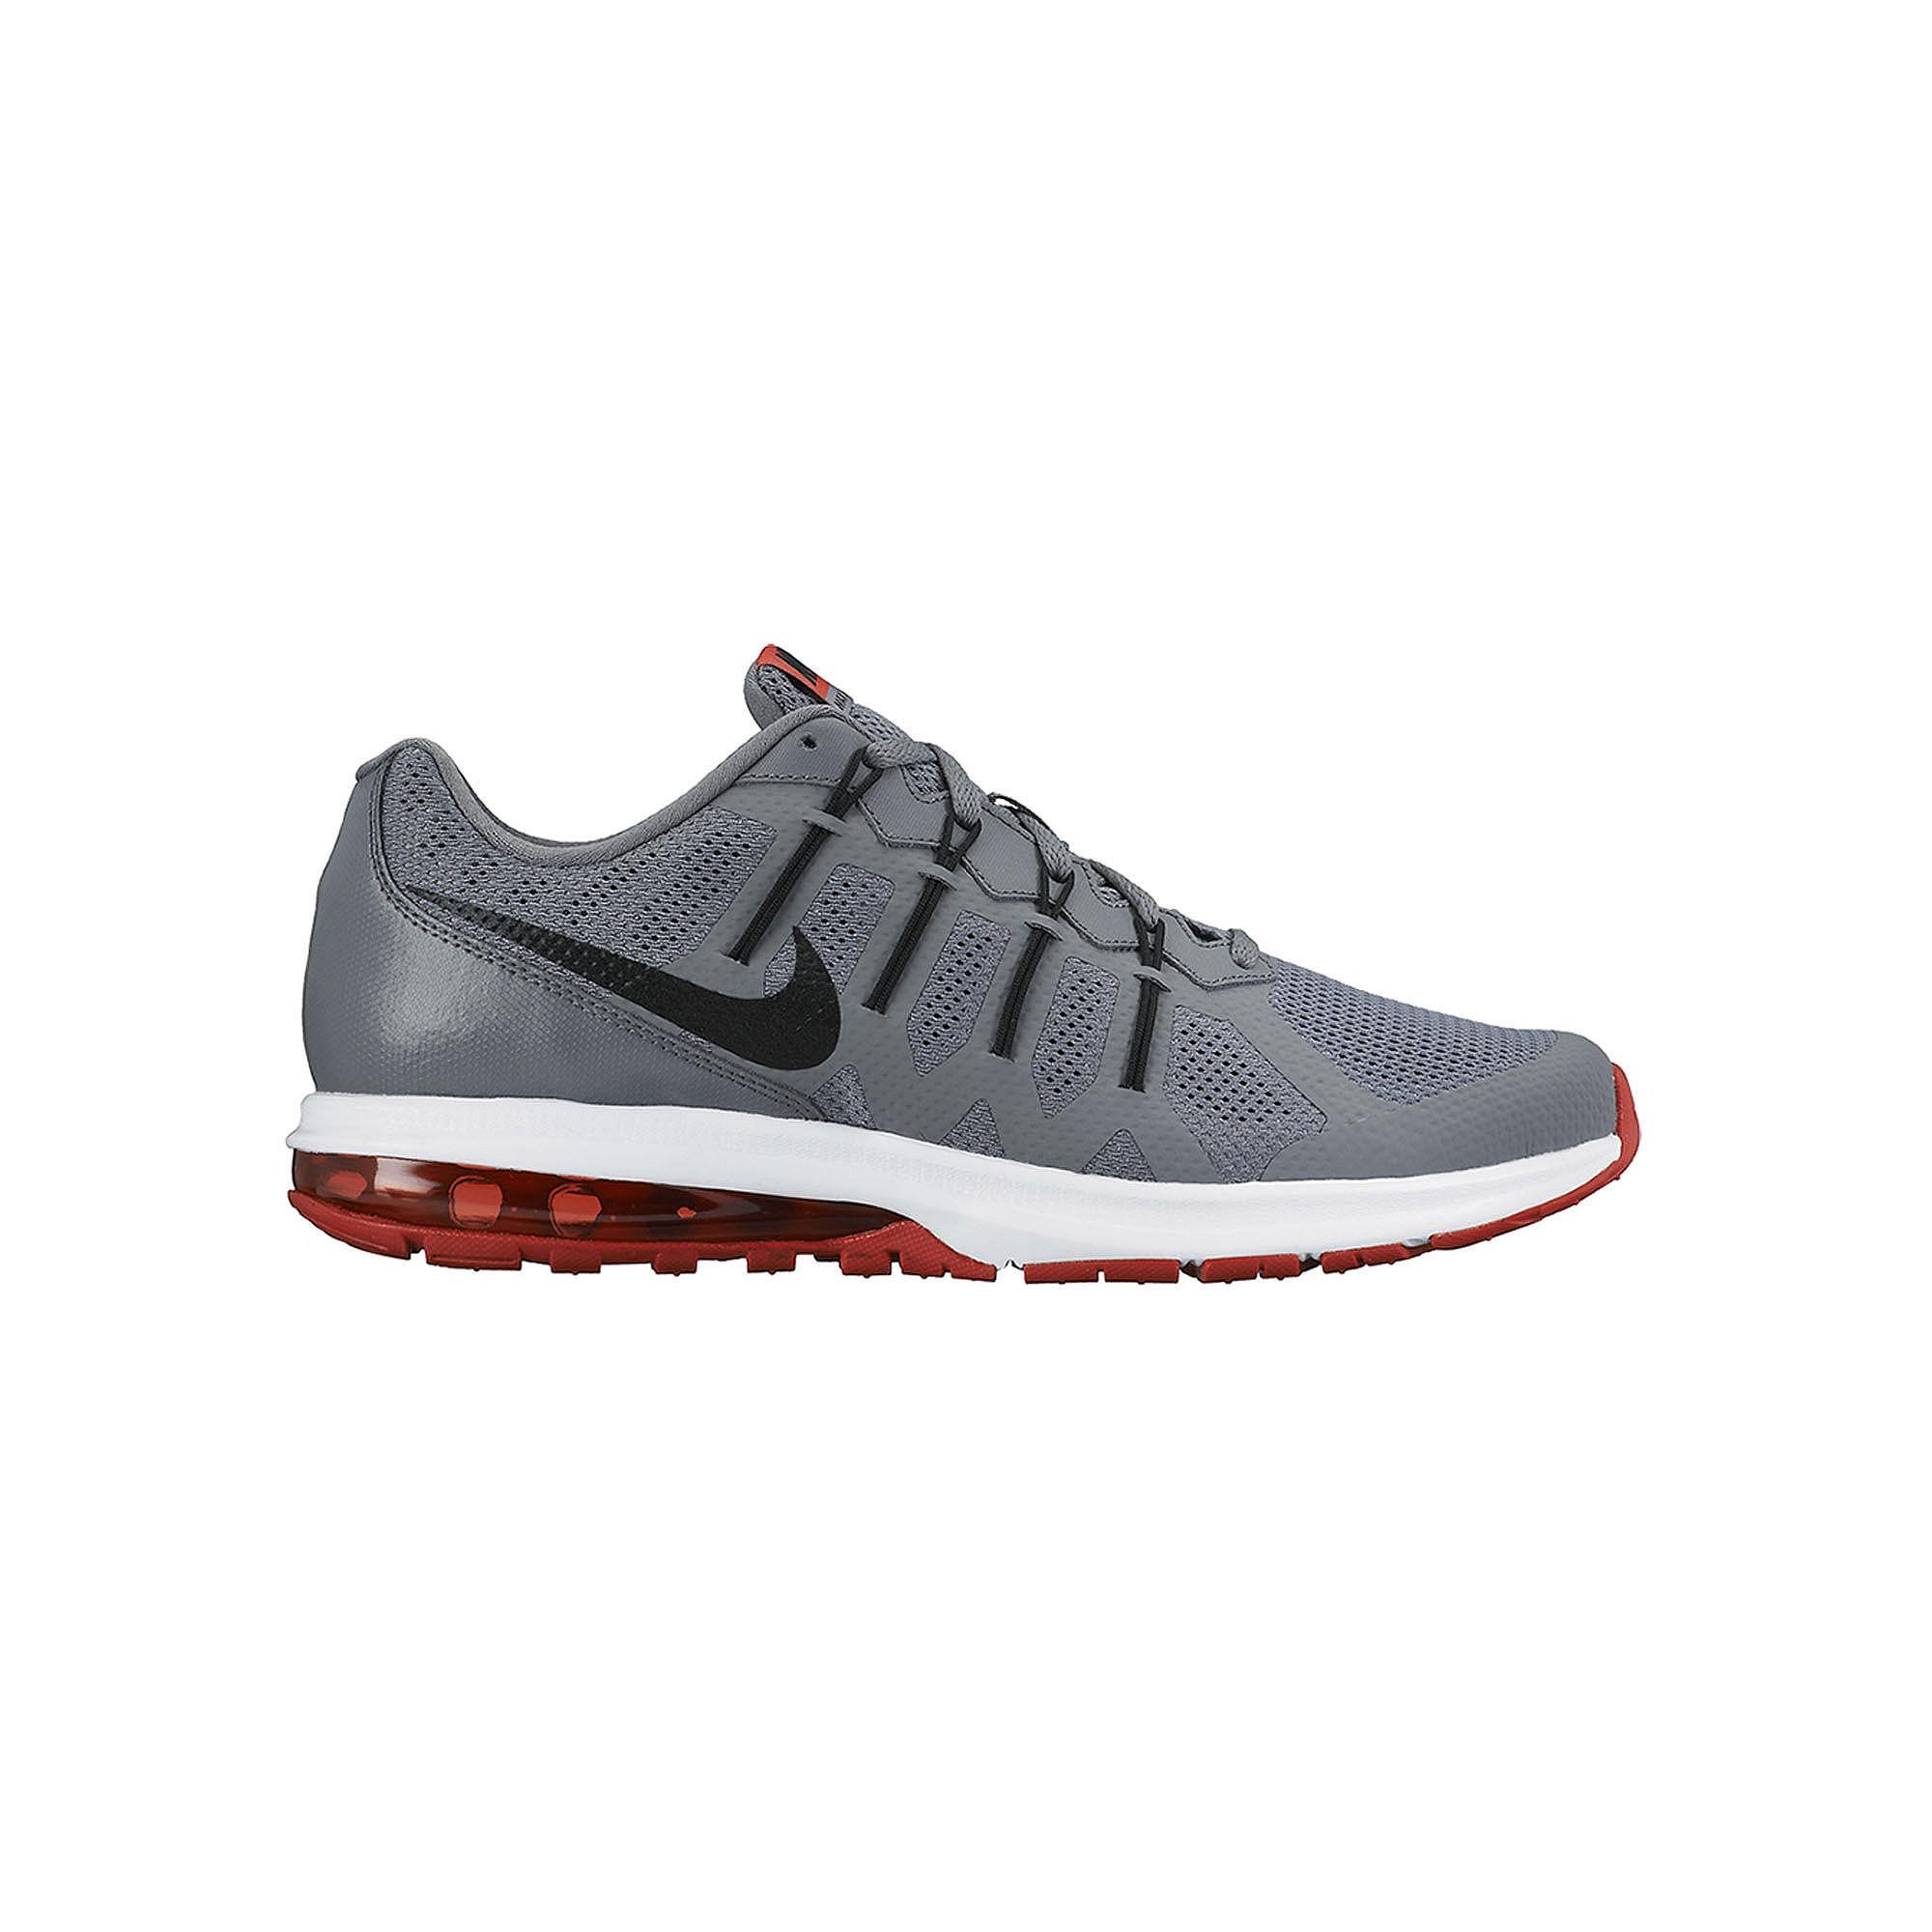 718ea29bf08c2 UPC 091206411905. ZOOM. UPC 091206411905 has following Product Name  Variations  Nike Air Max Dynasty Men Us 11 Gray Running Shoe ...